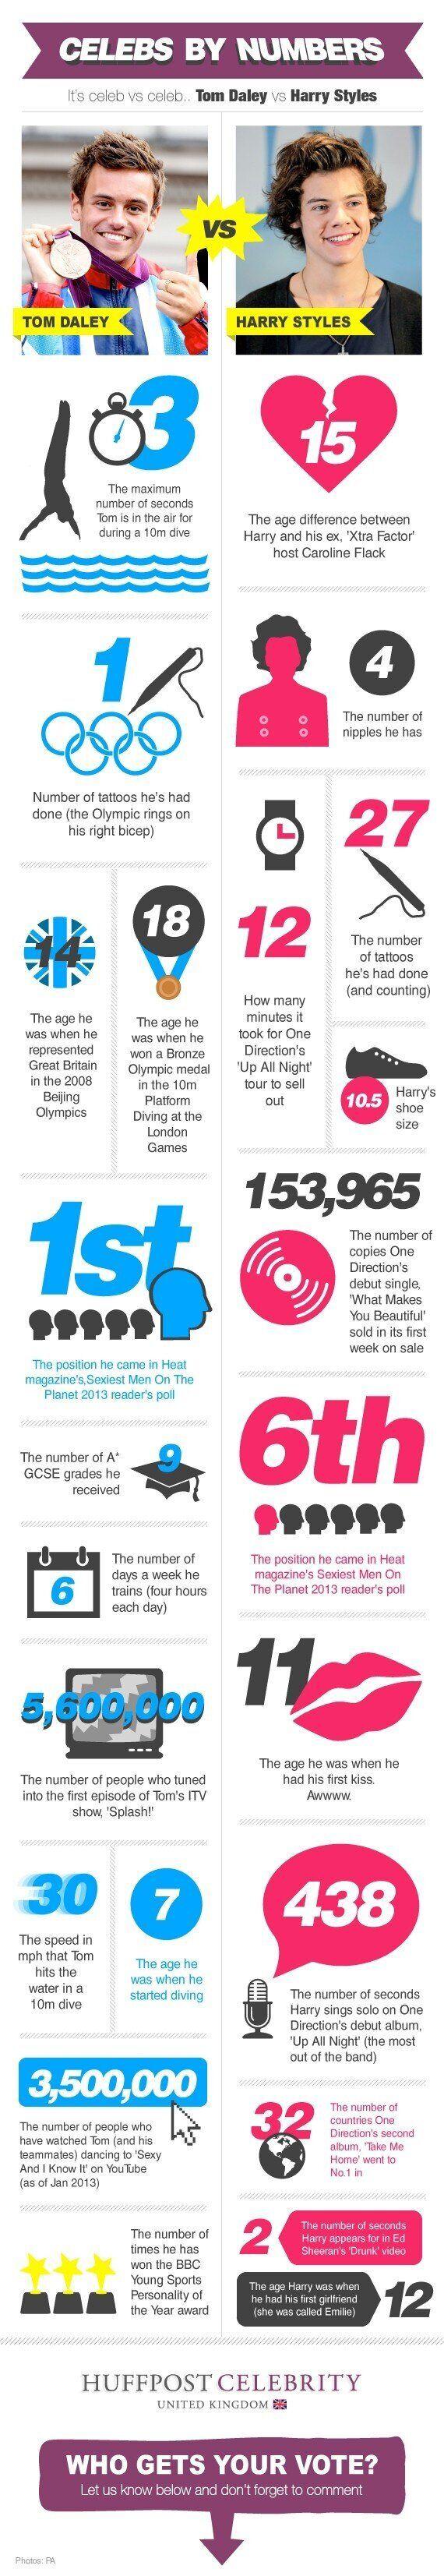 Celebs By Numbers: Harry Styles vs. Tom